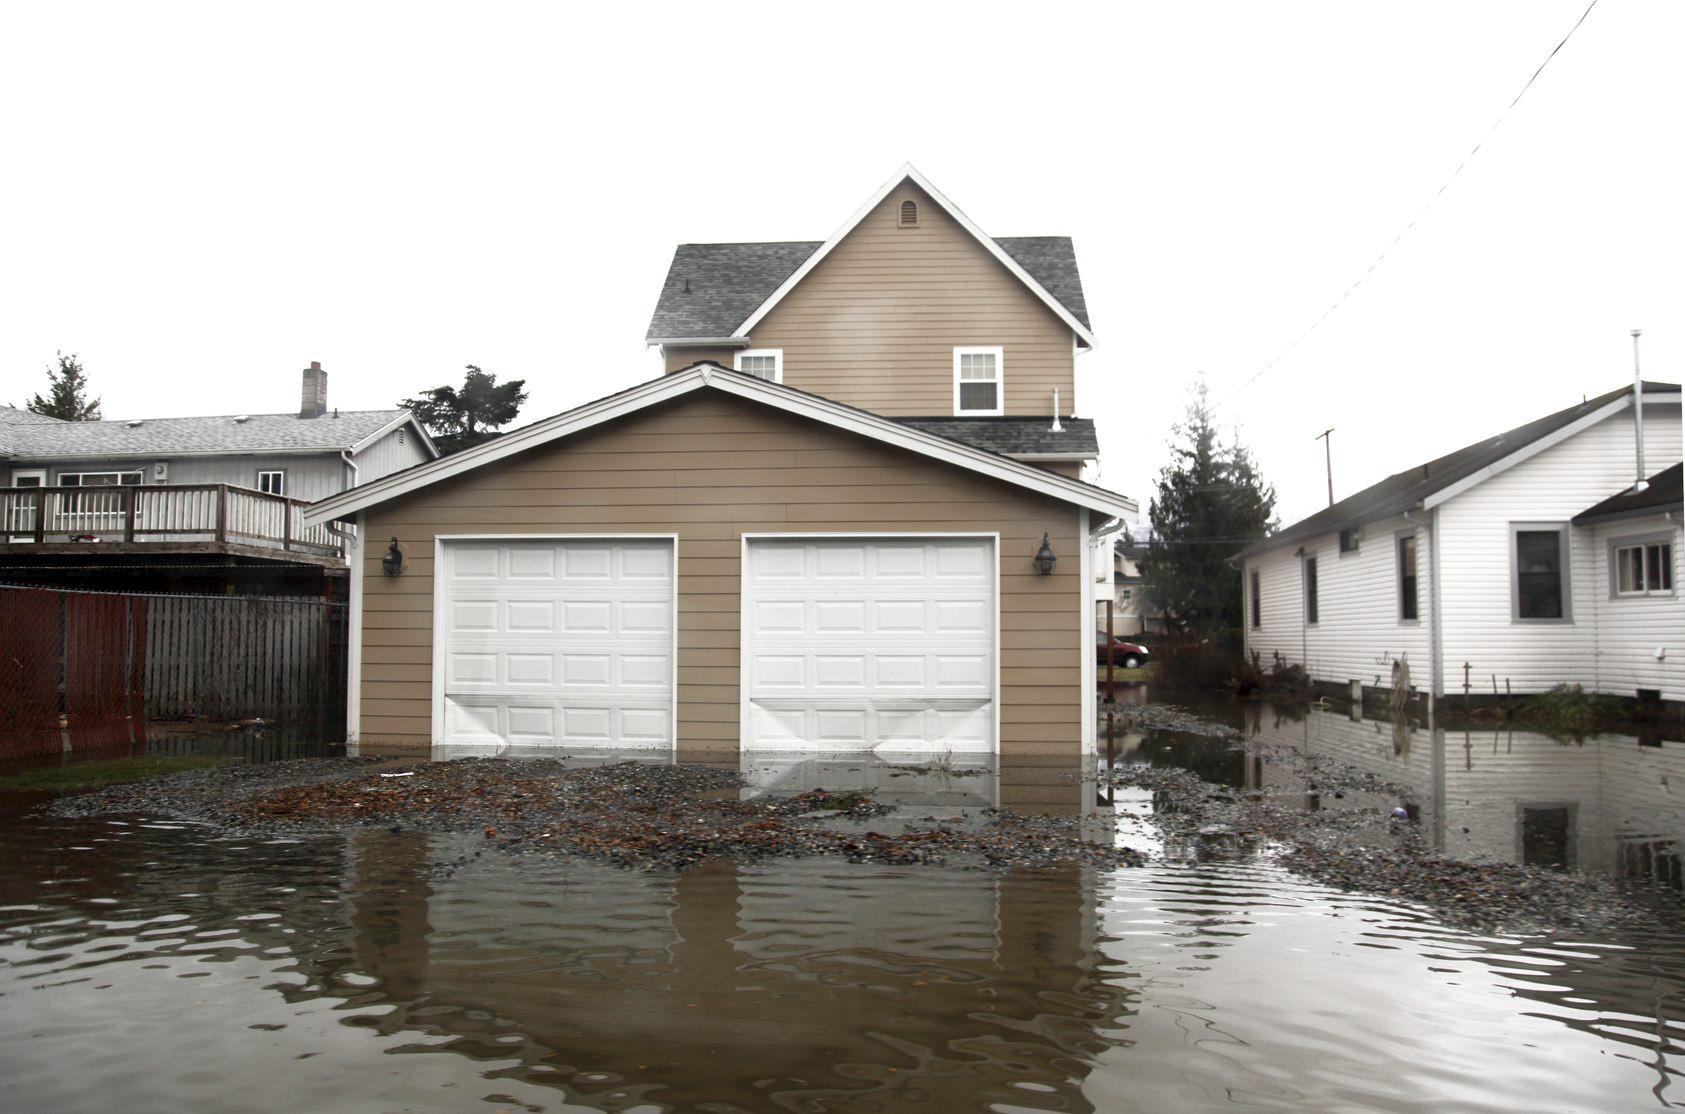 Flooding Health Hazards